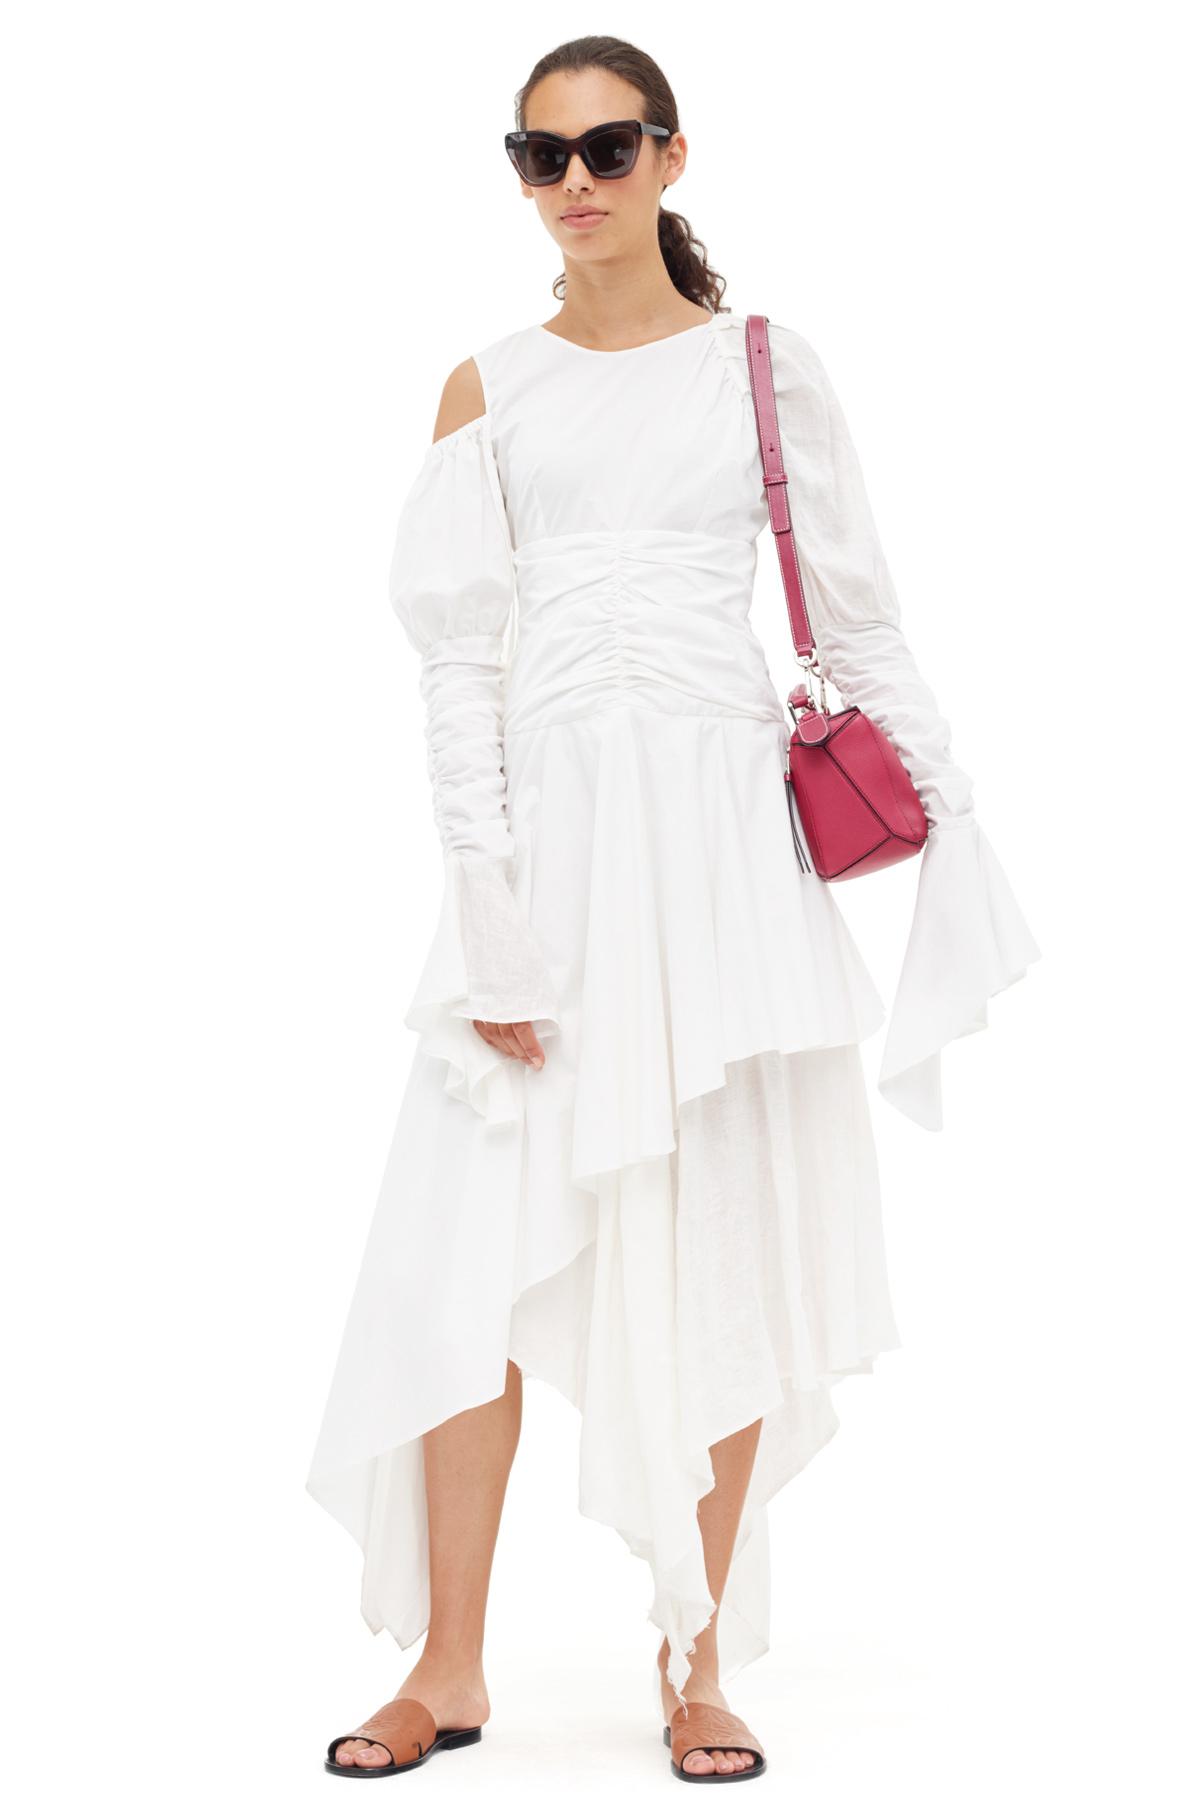 LOEWE Gathered Dress Blanco front